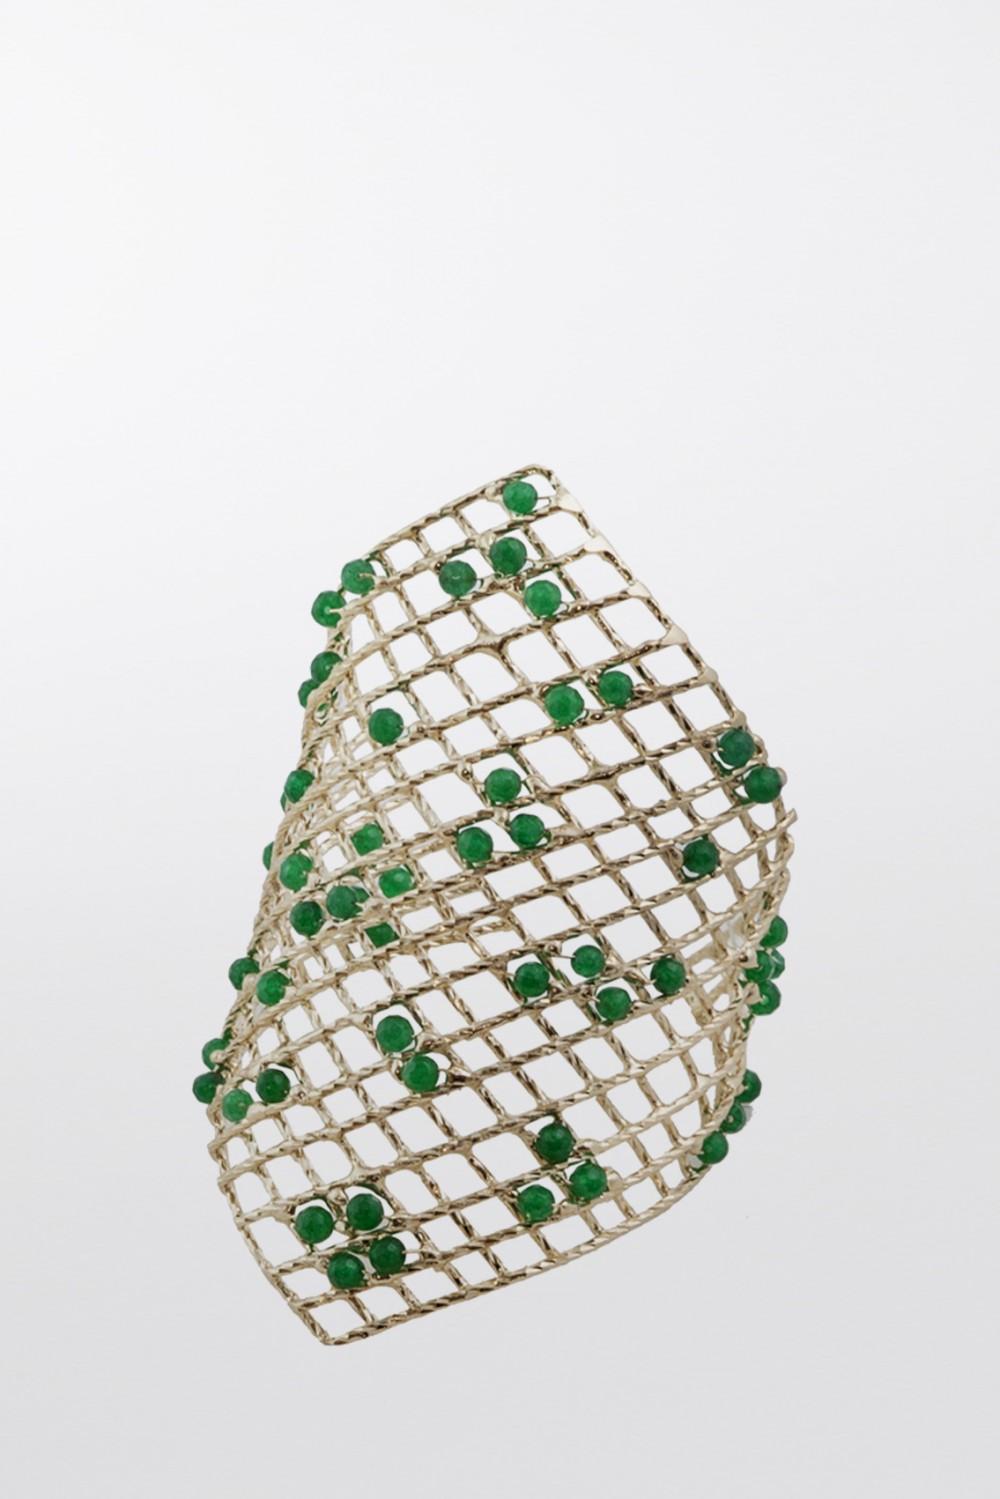 Bracciale rigido con quarzi verdi incastonati